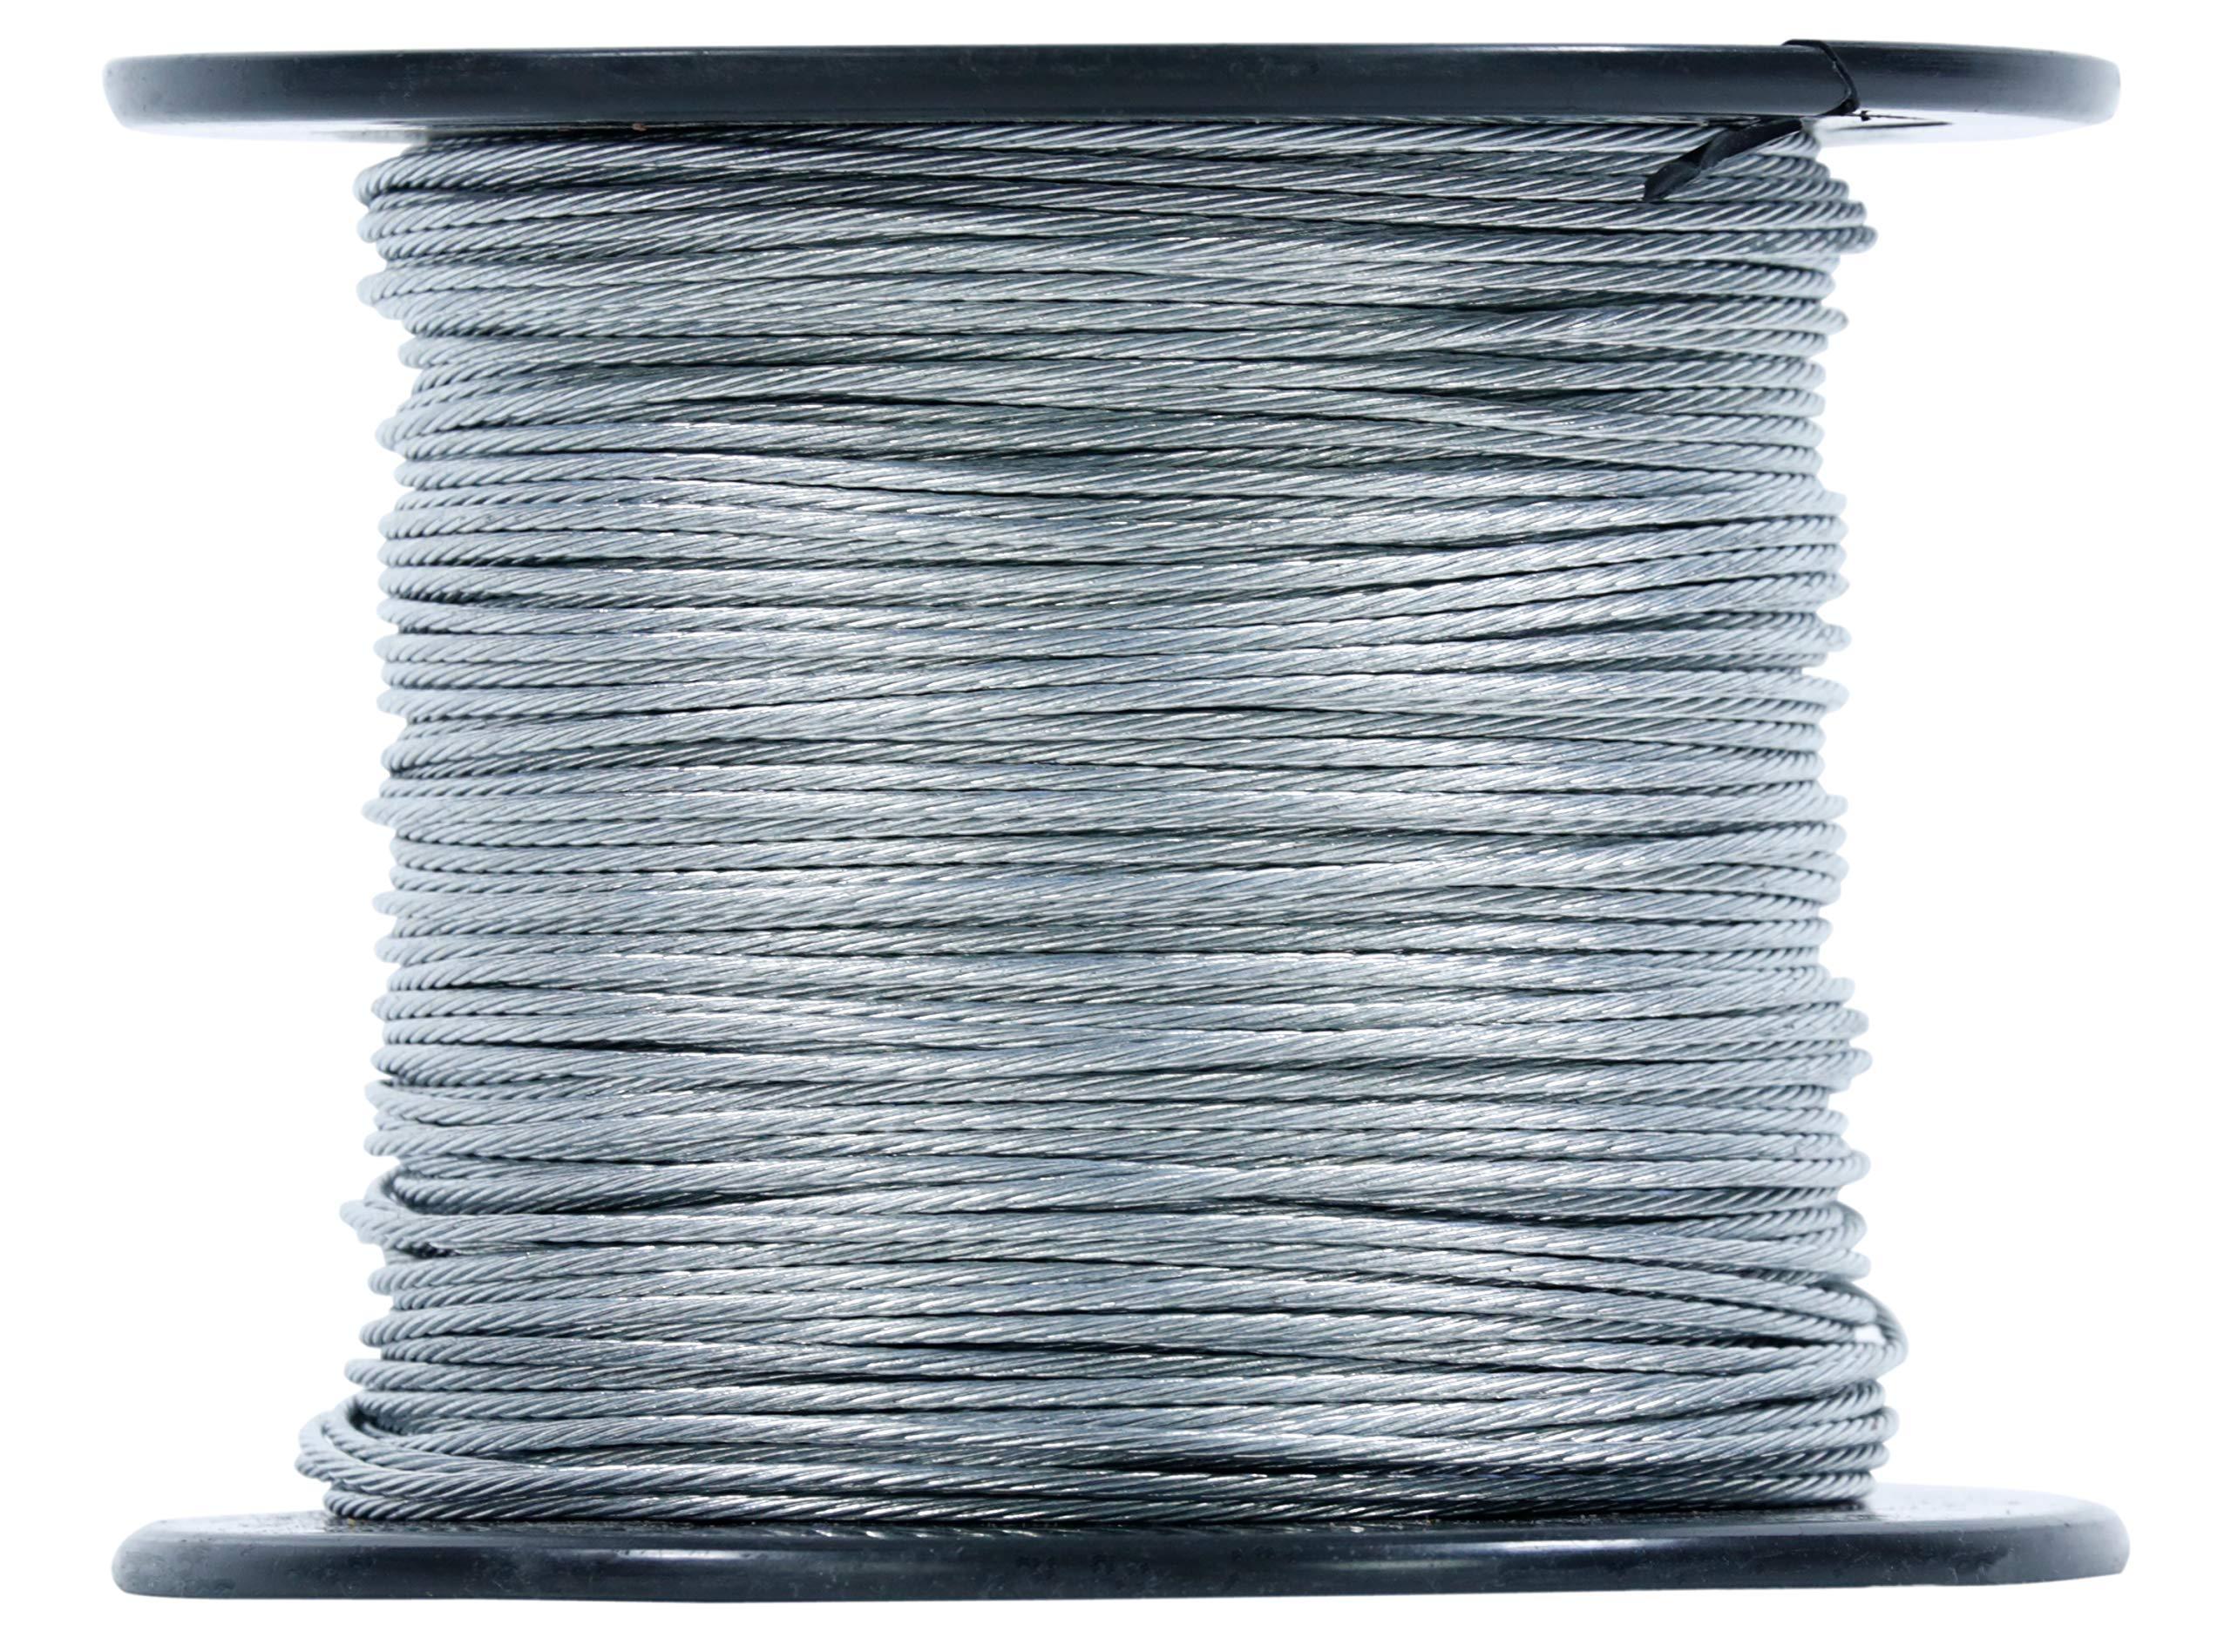 Channel Master CM-9081 Guy Wire 500 Foot Spool Galvanized Steel